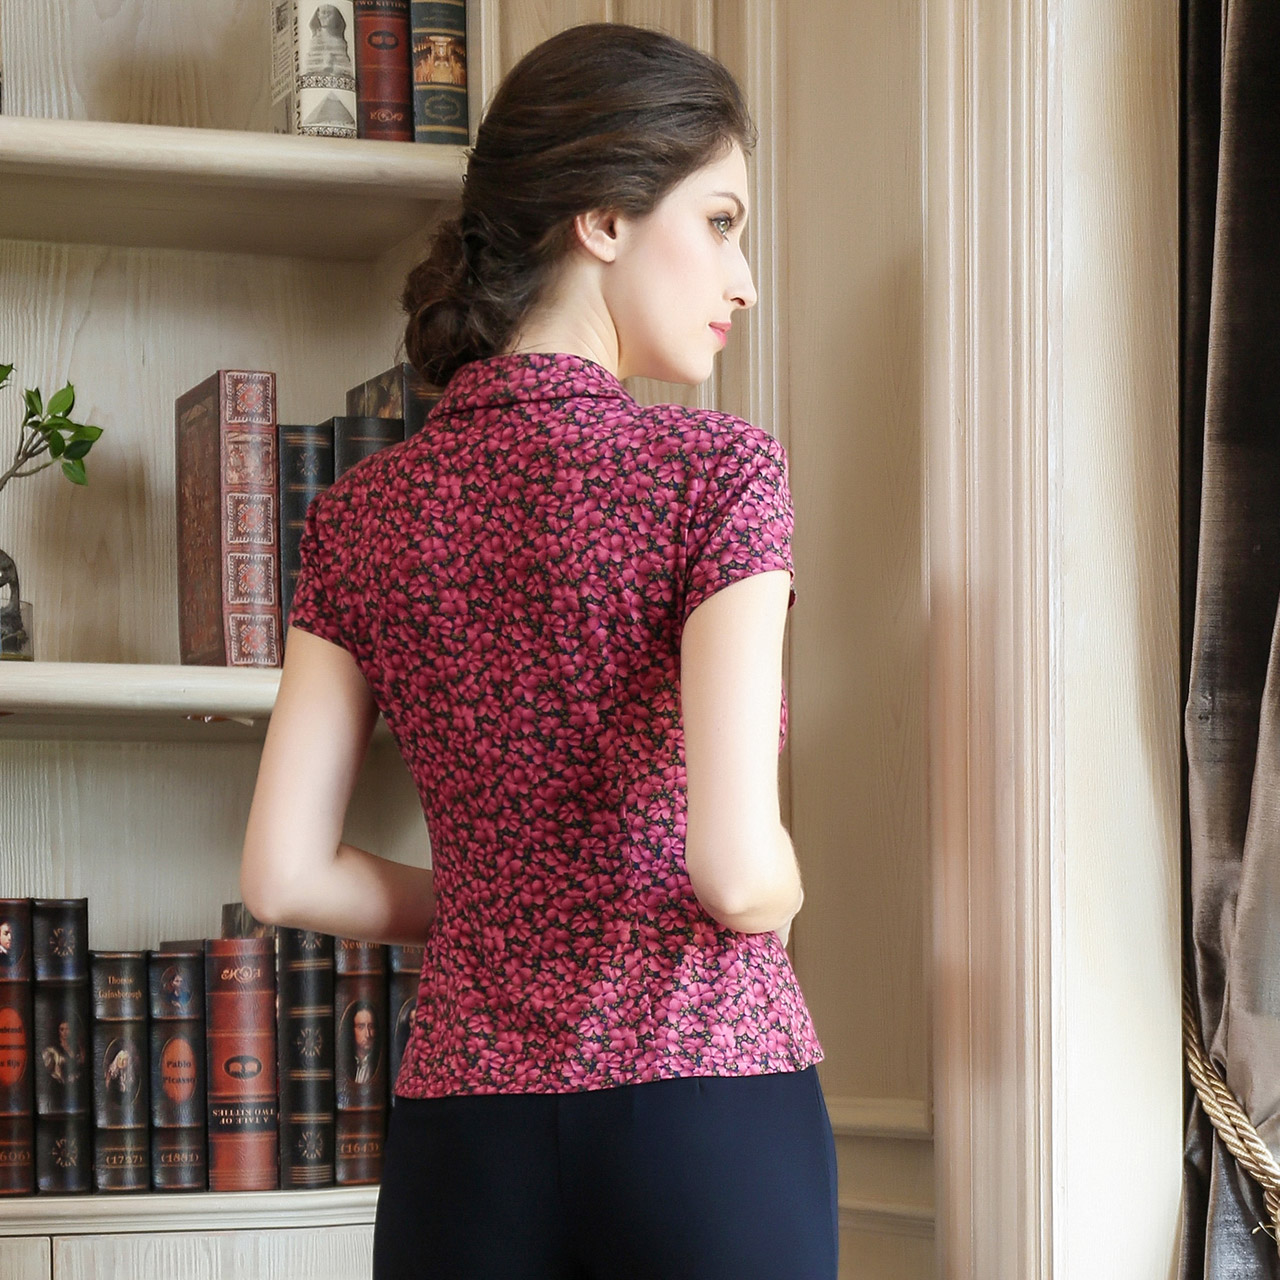 MORELINE沐兰夏季新品娃娃领修身显瘦碎花弹力短袖衬衫女士上衣